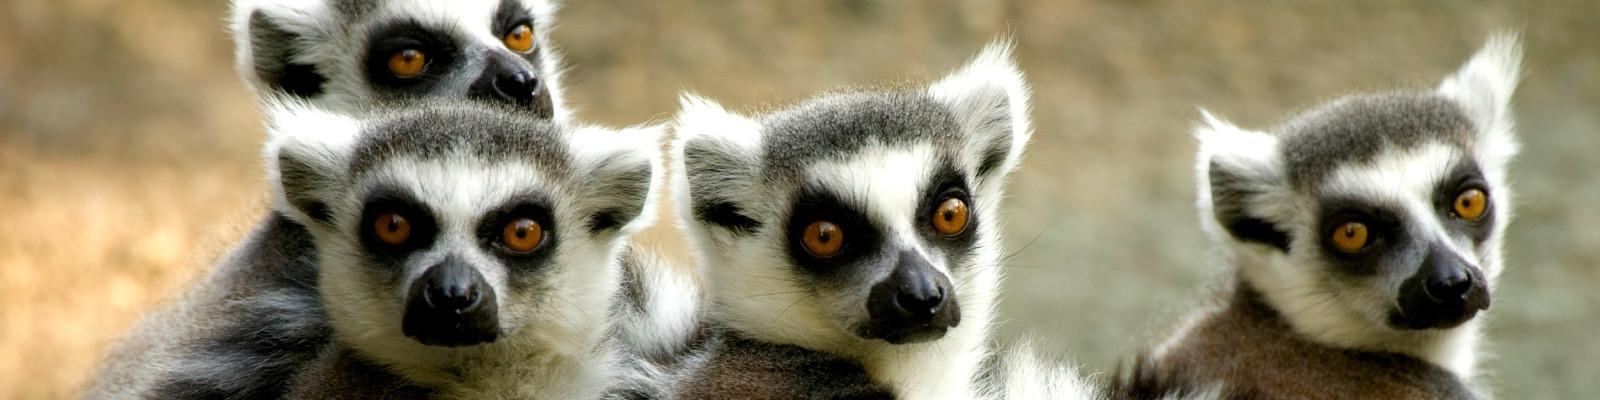 Lemuren auf Madagaskar Reisen